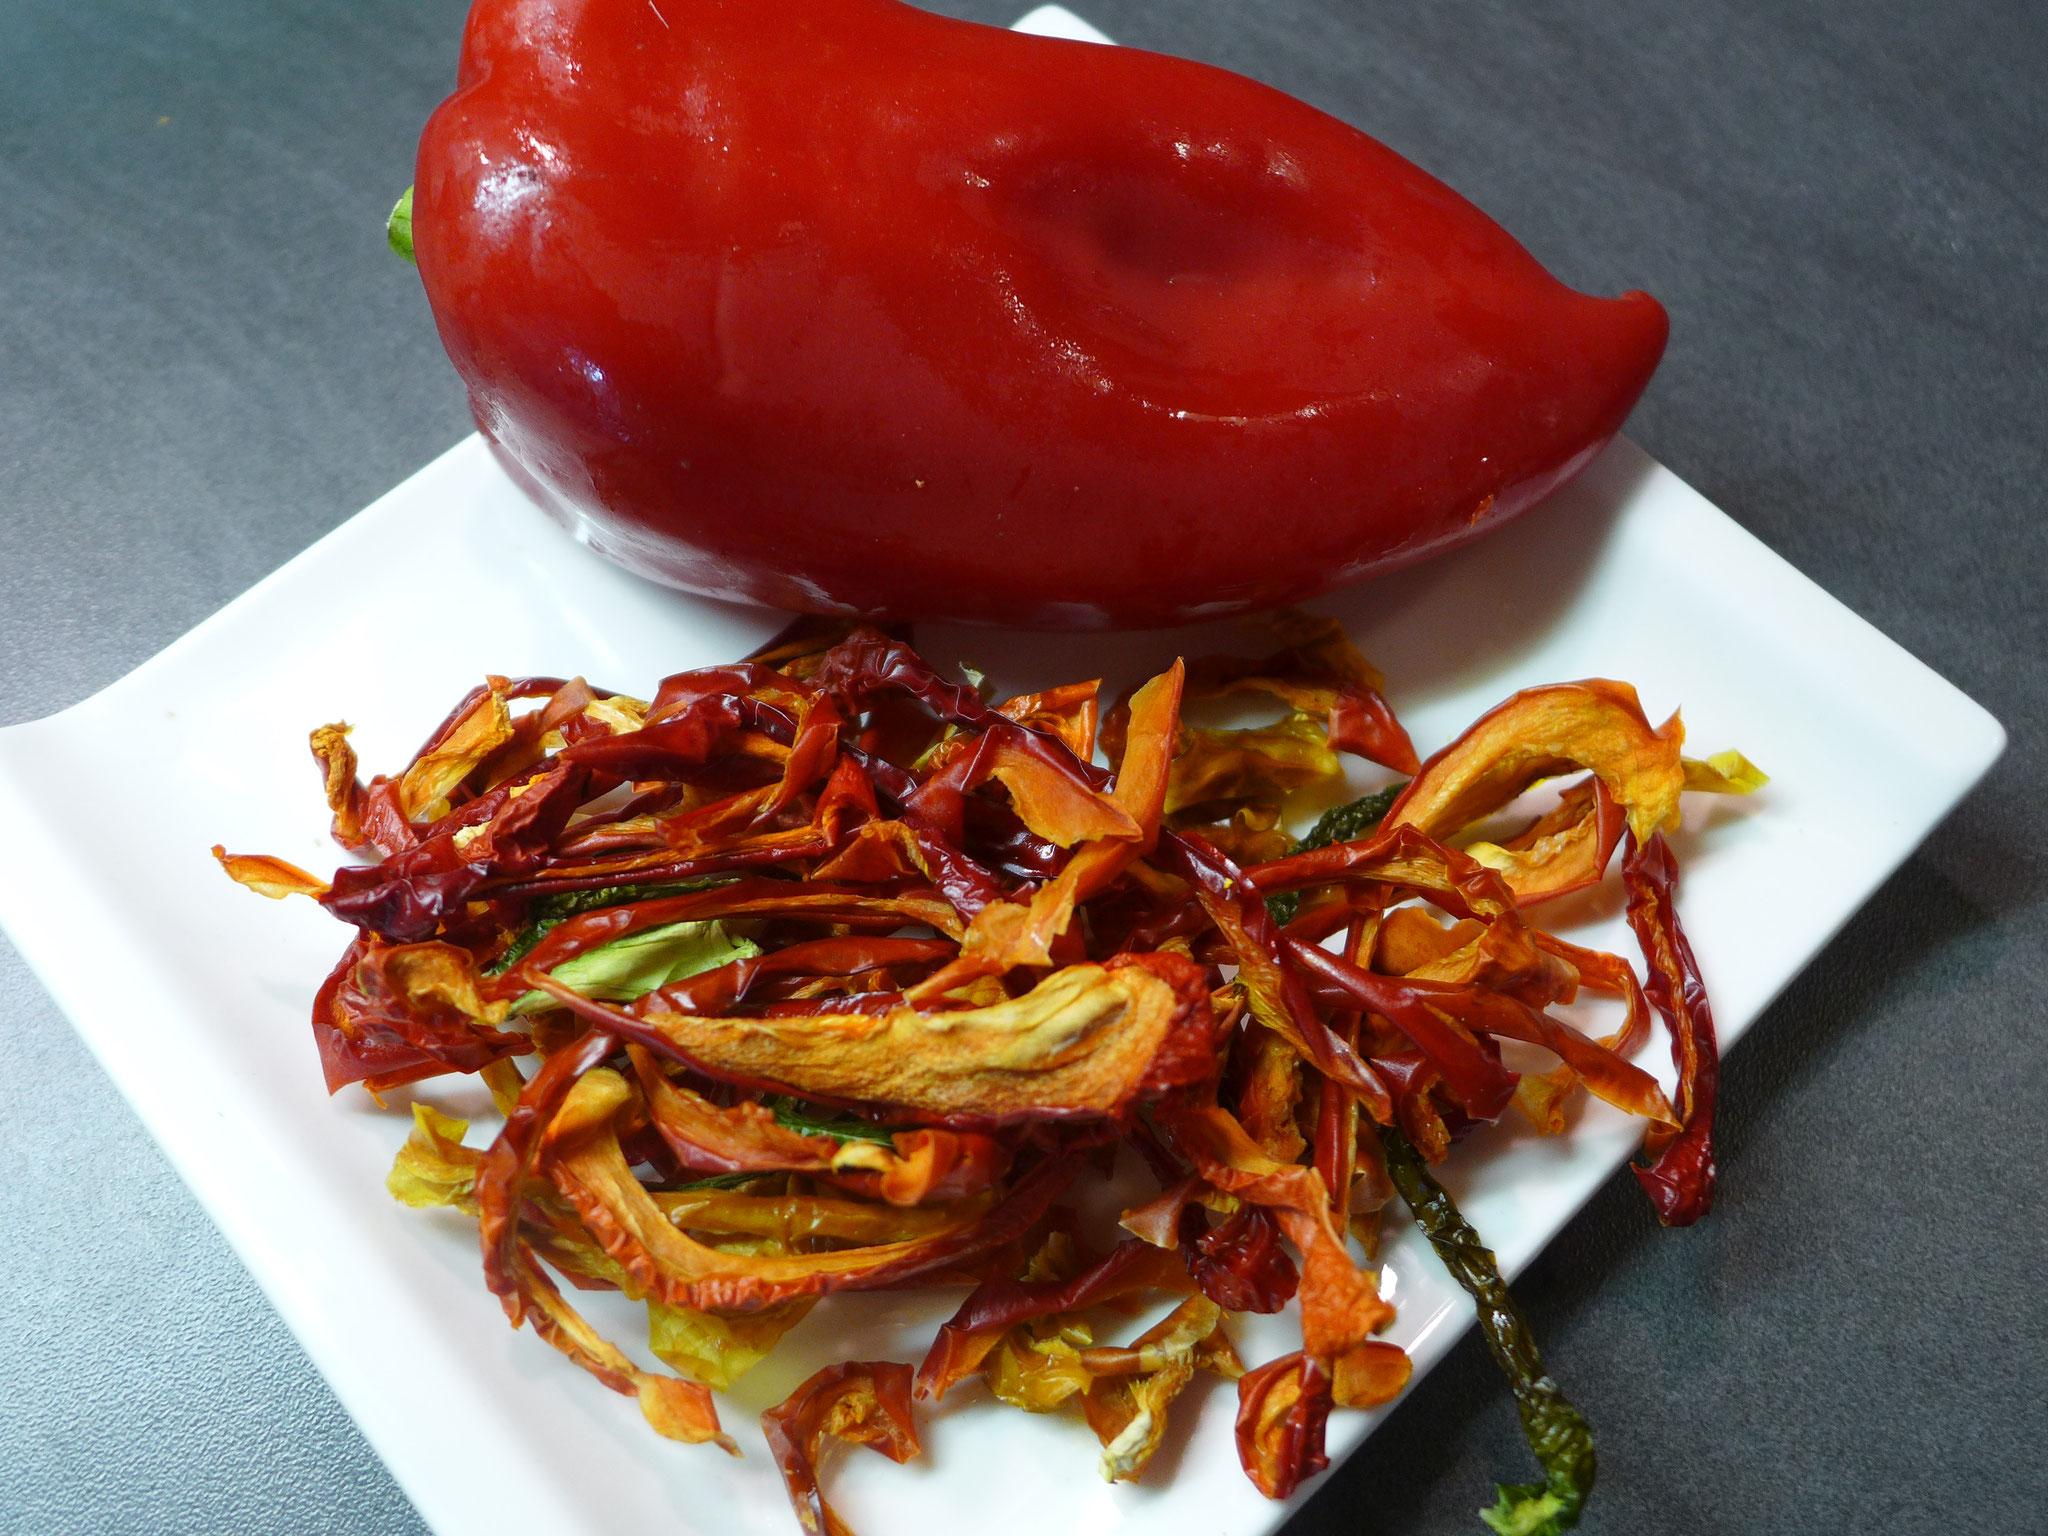 Paprika am besten grüne